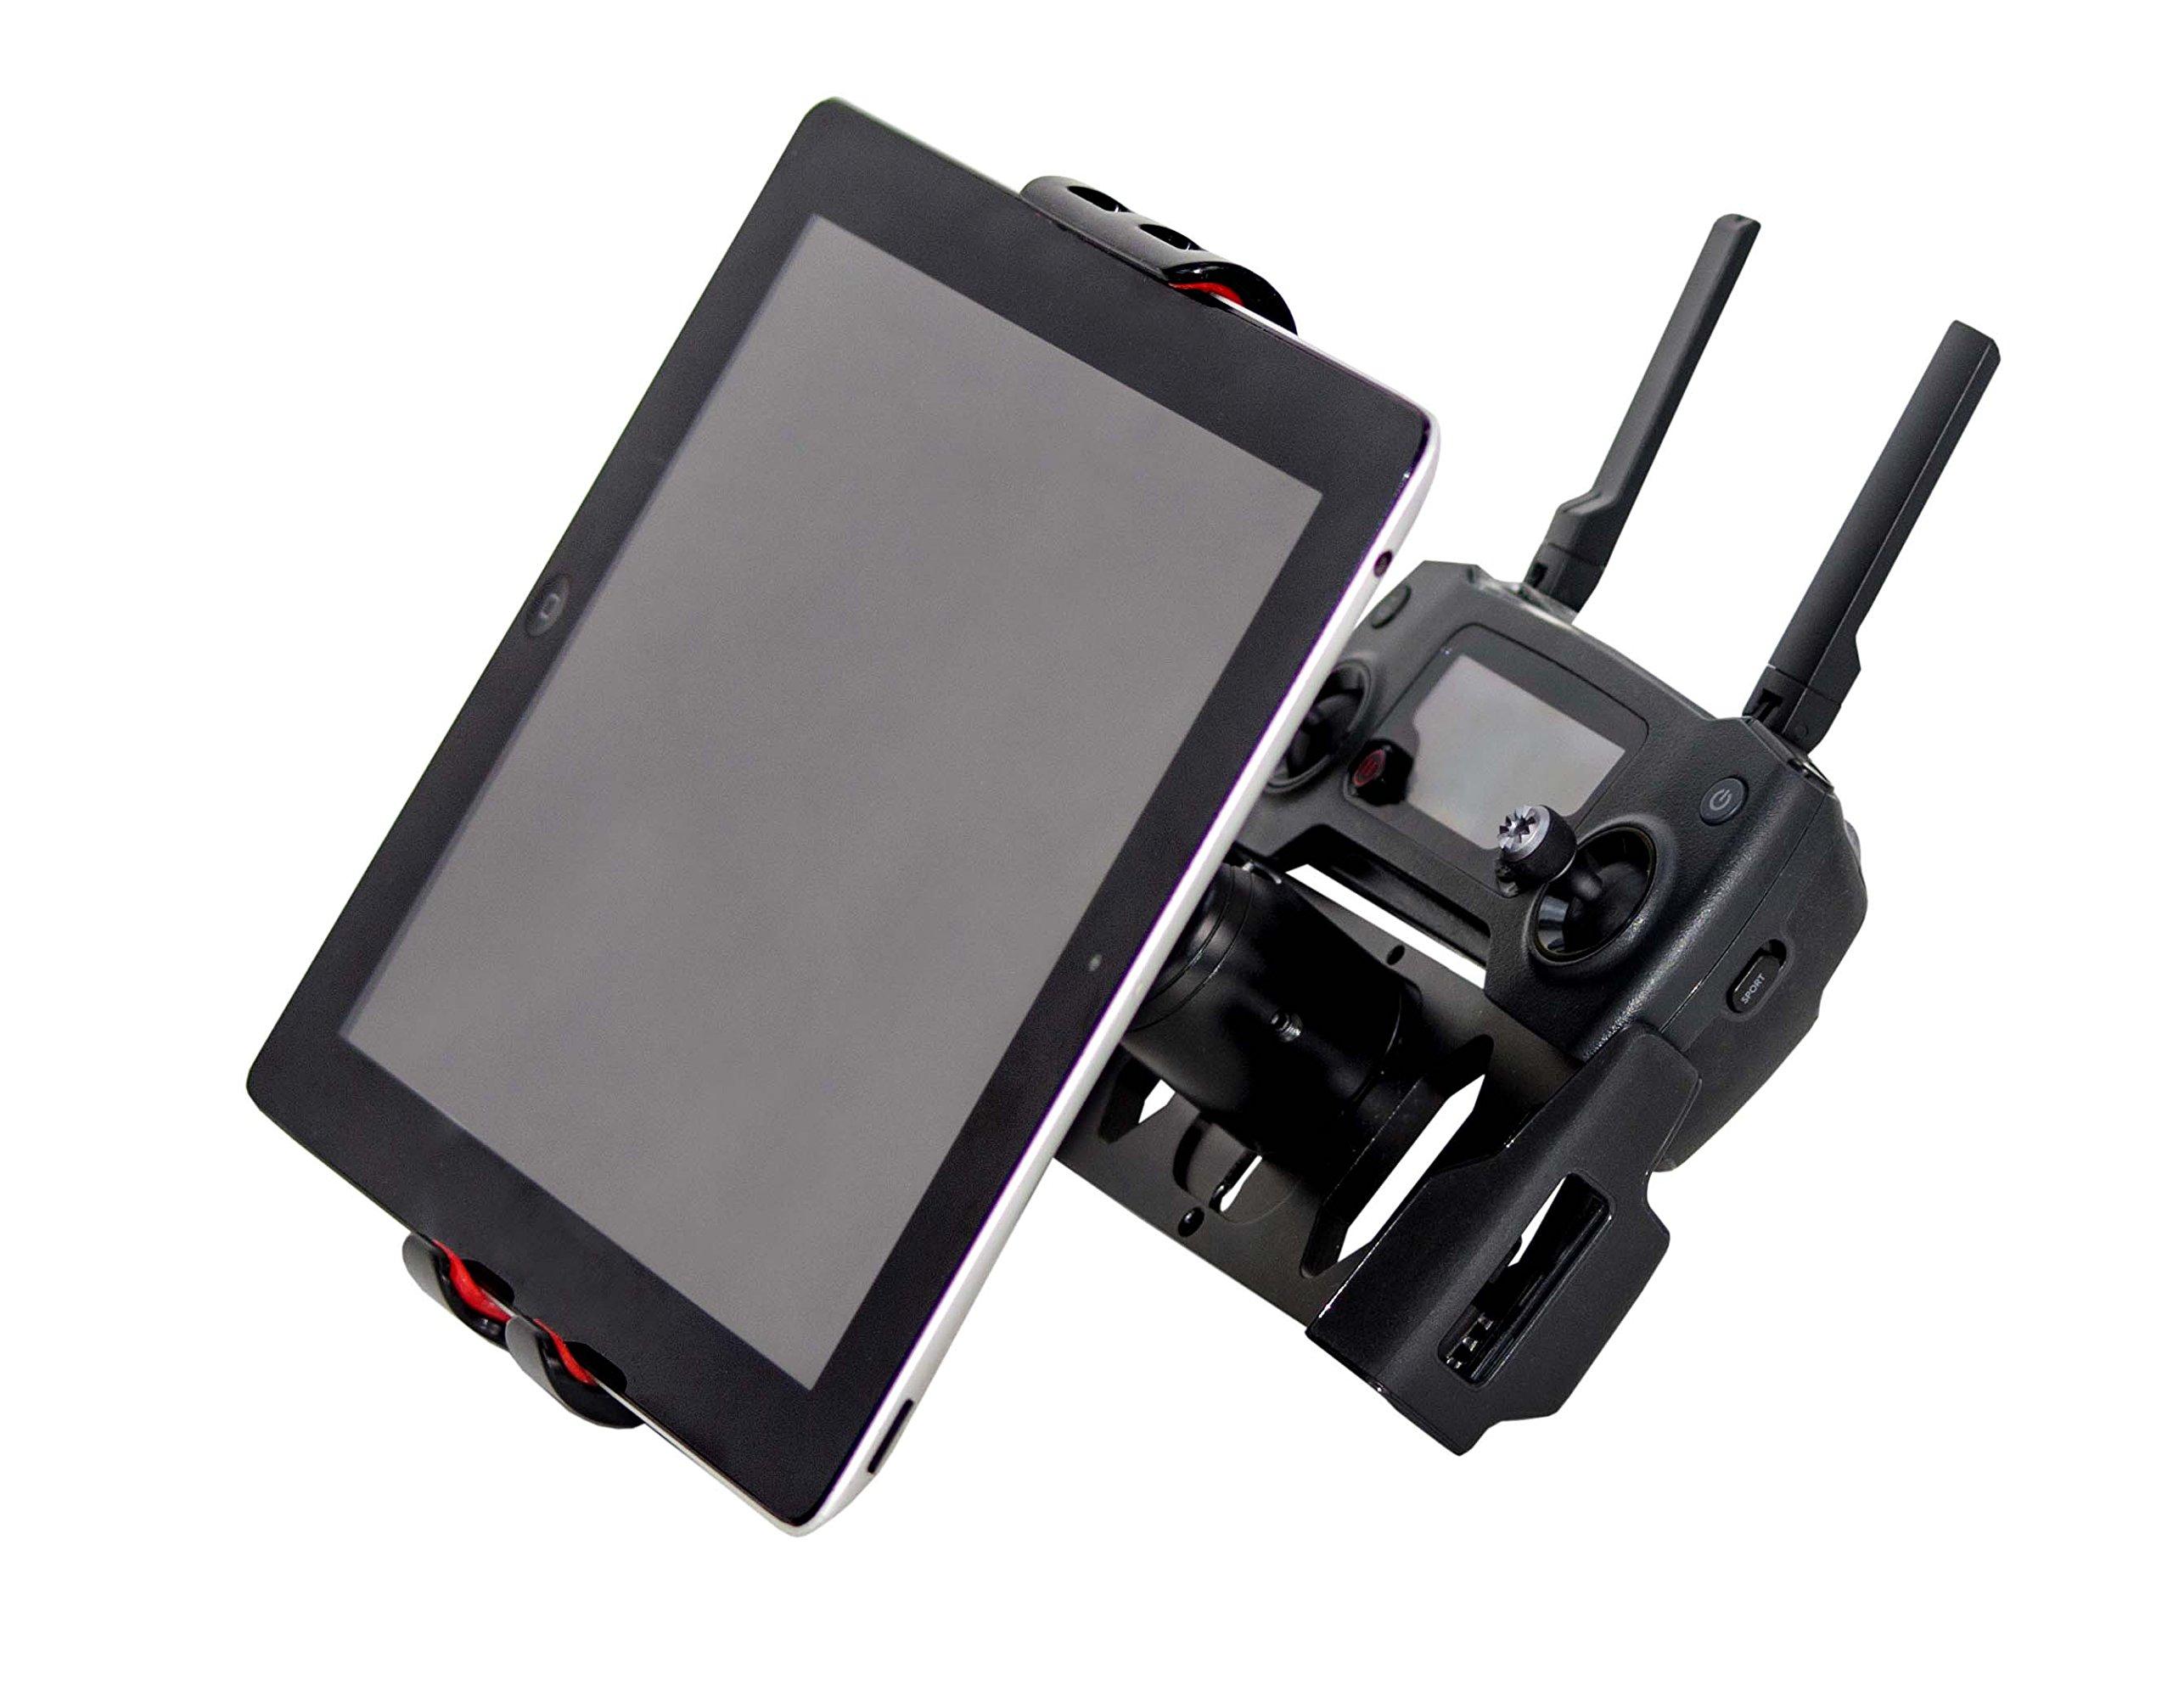 Freewell Universal Tablet Mount Compatible With DJI Mavic Pro/Platinum/Alpine White/Mavic Air/DJI Spark